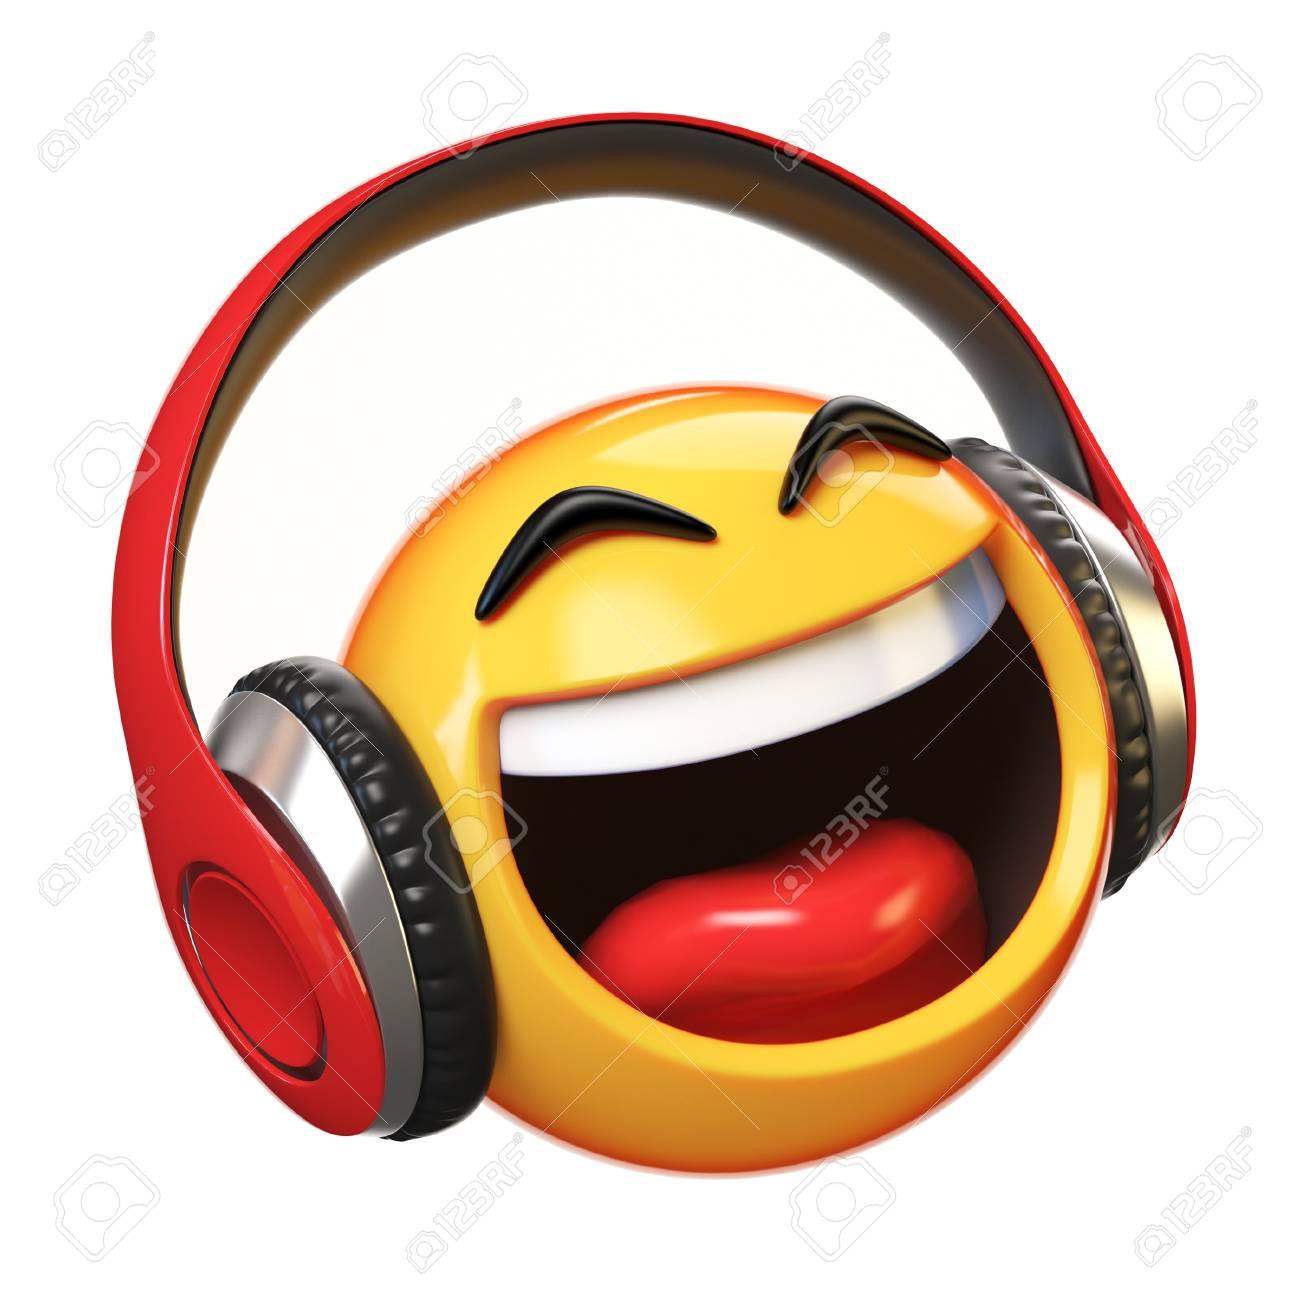 Music emoji with headphones isolated on white background, emoticon